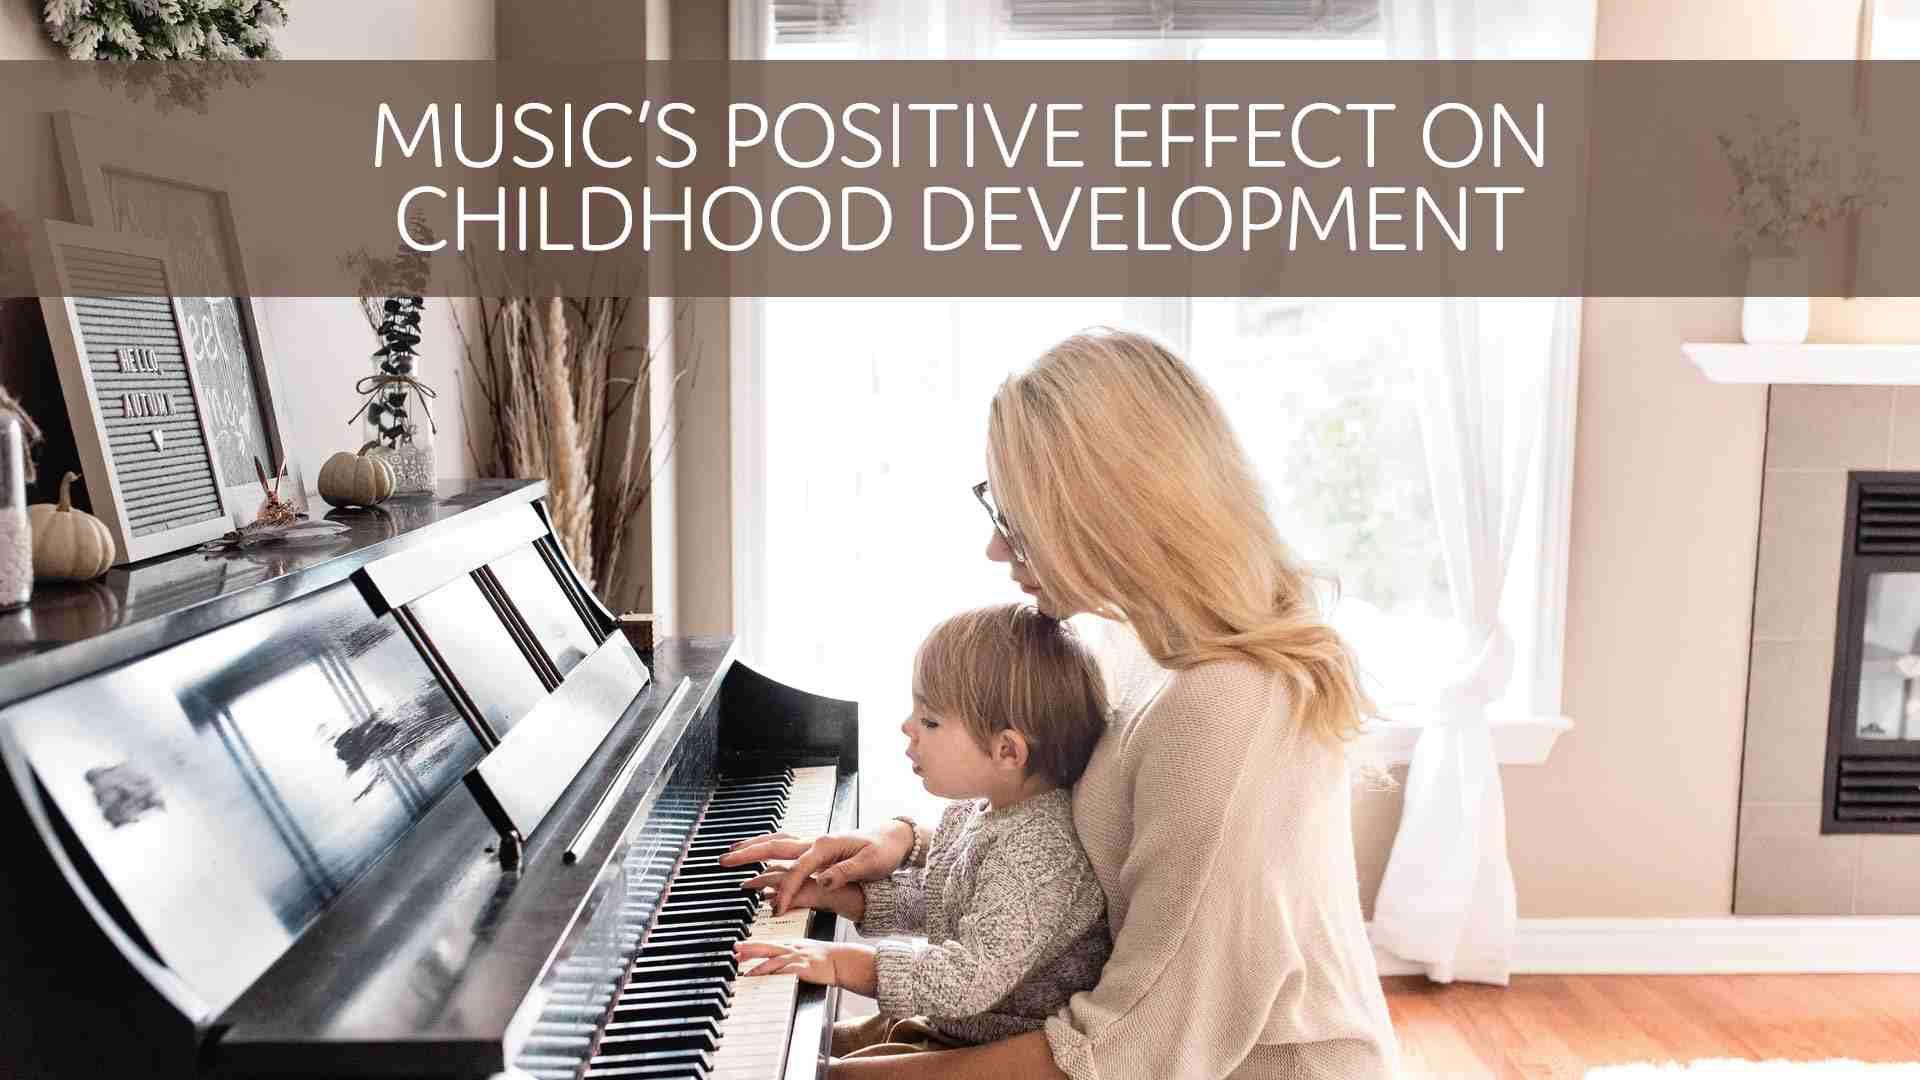 Music's Positive Effect on Childhood Development